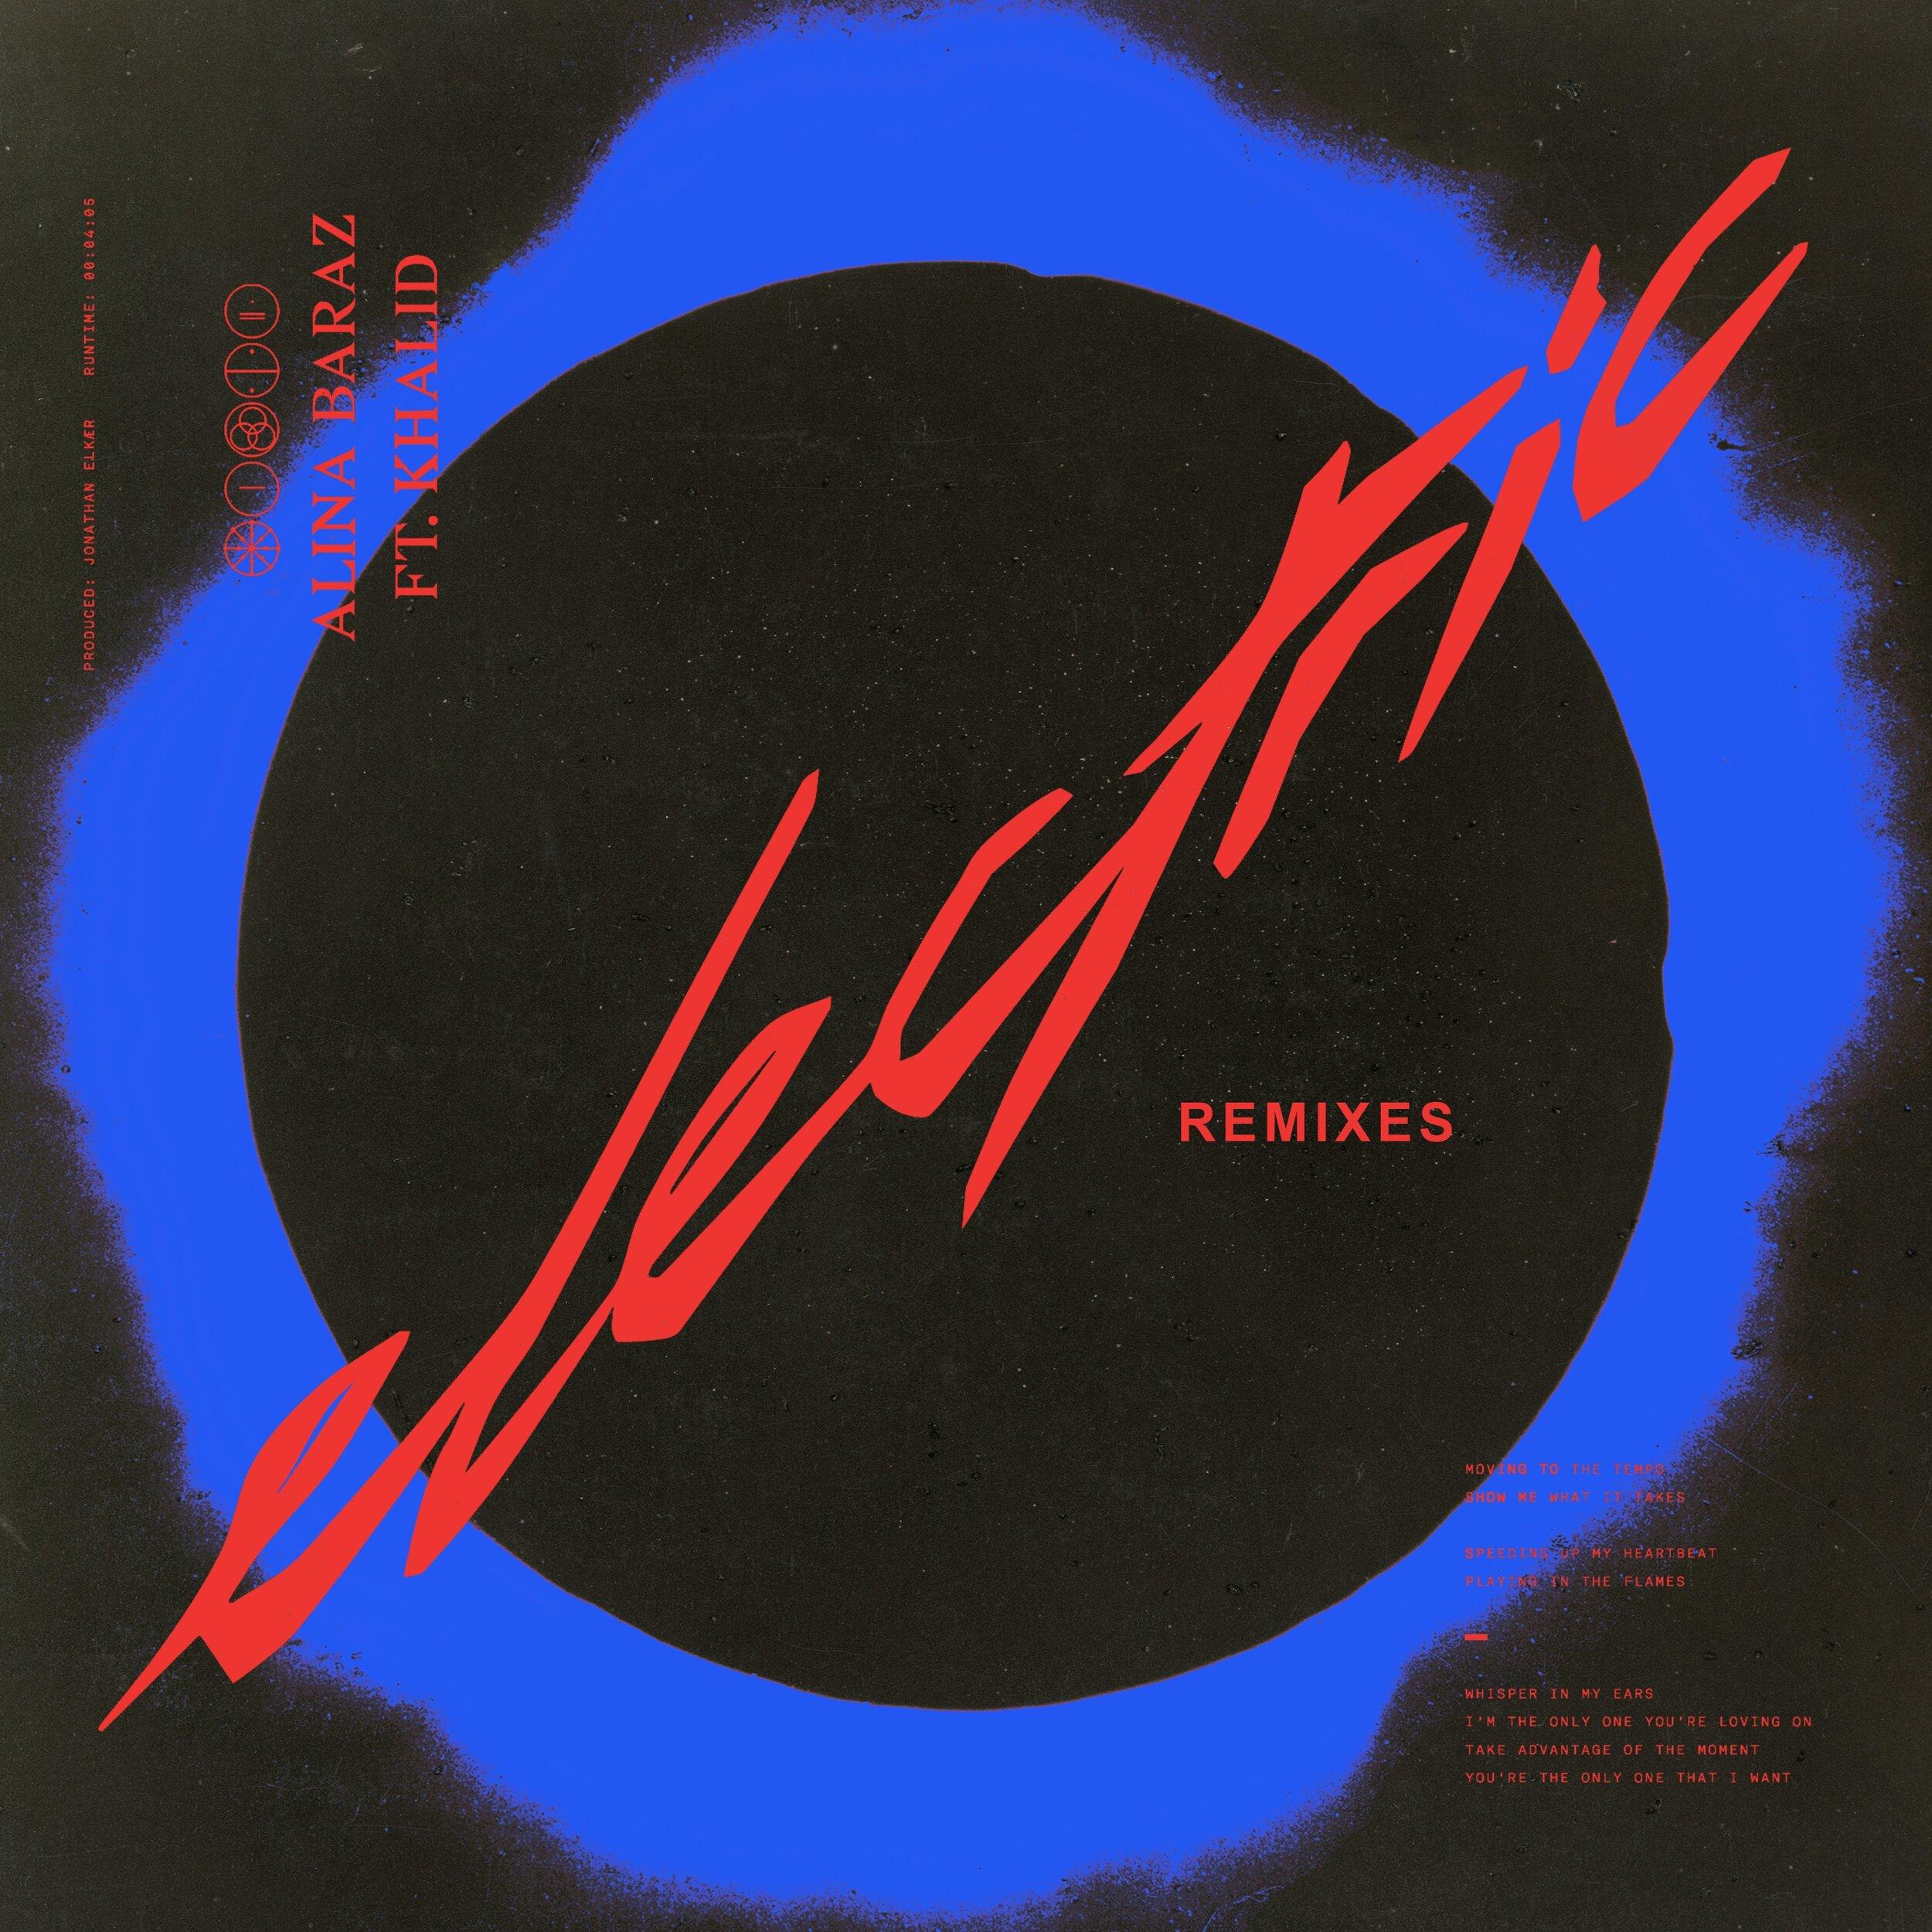 electric remixes 3000x3000.jpg